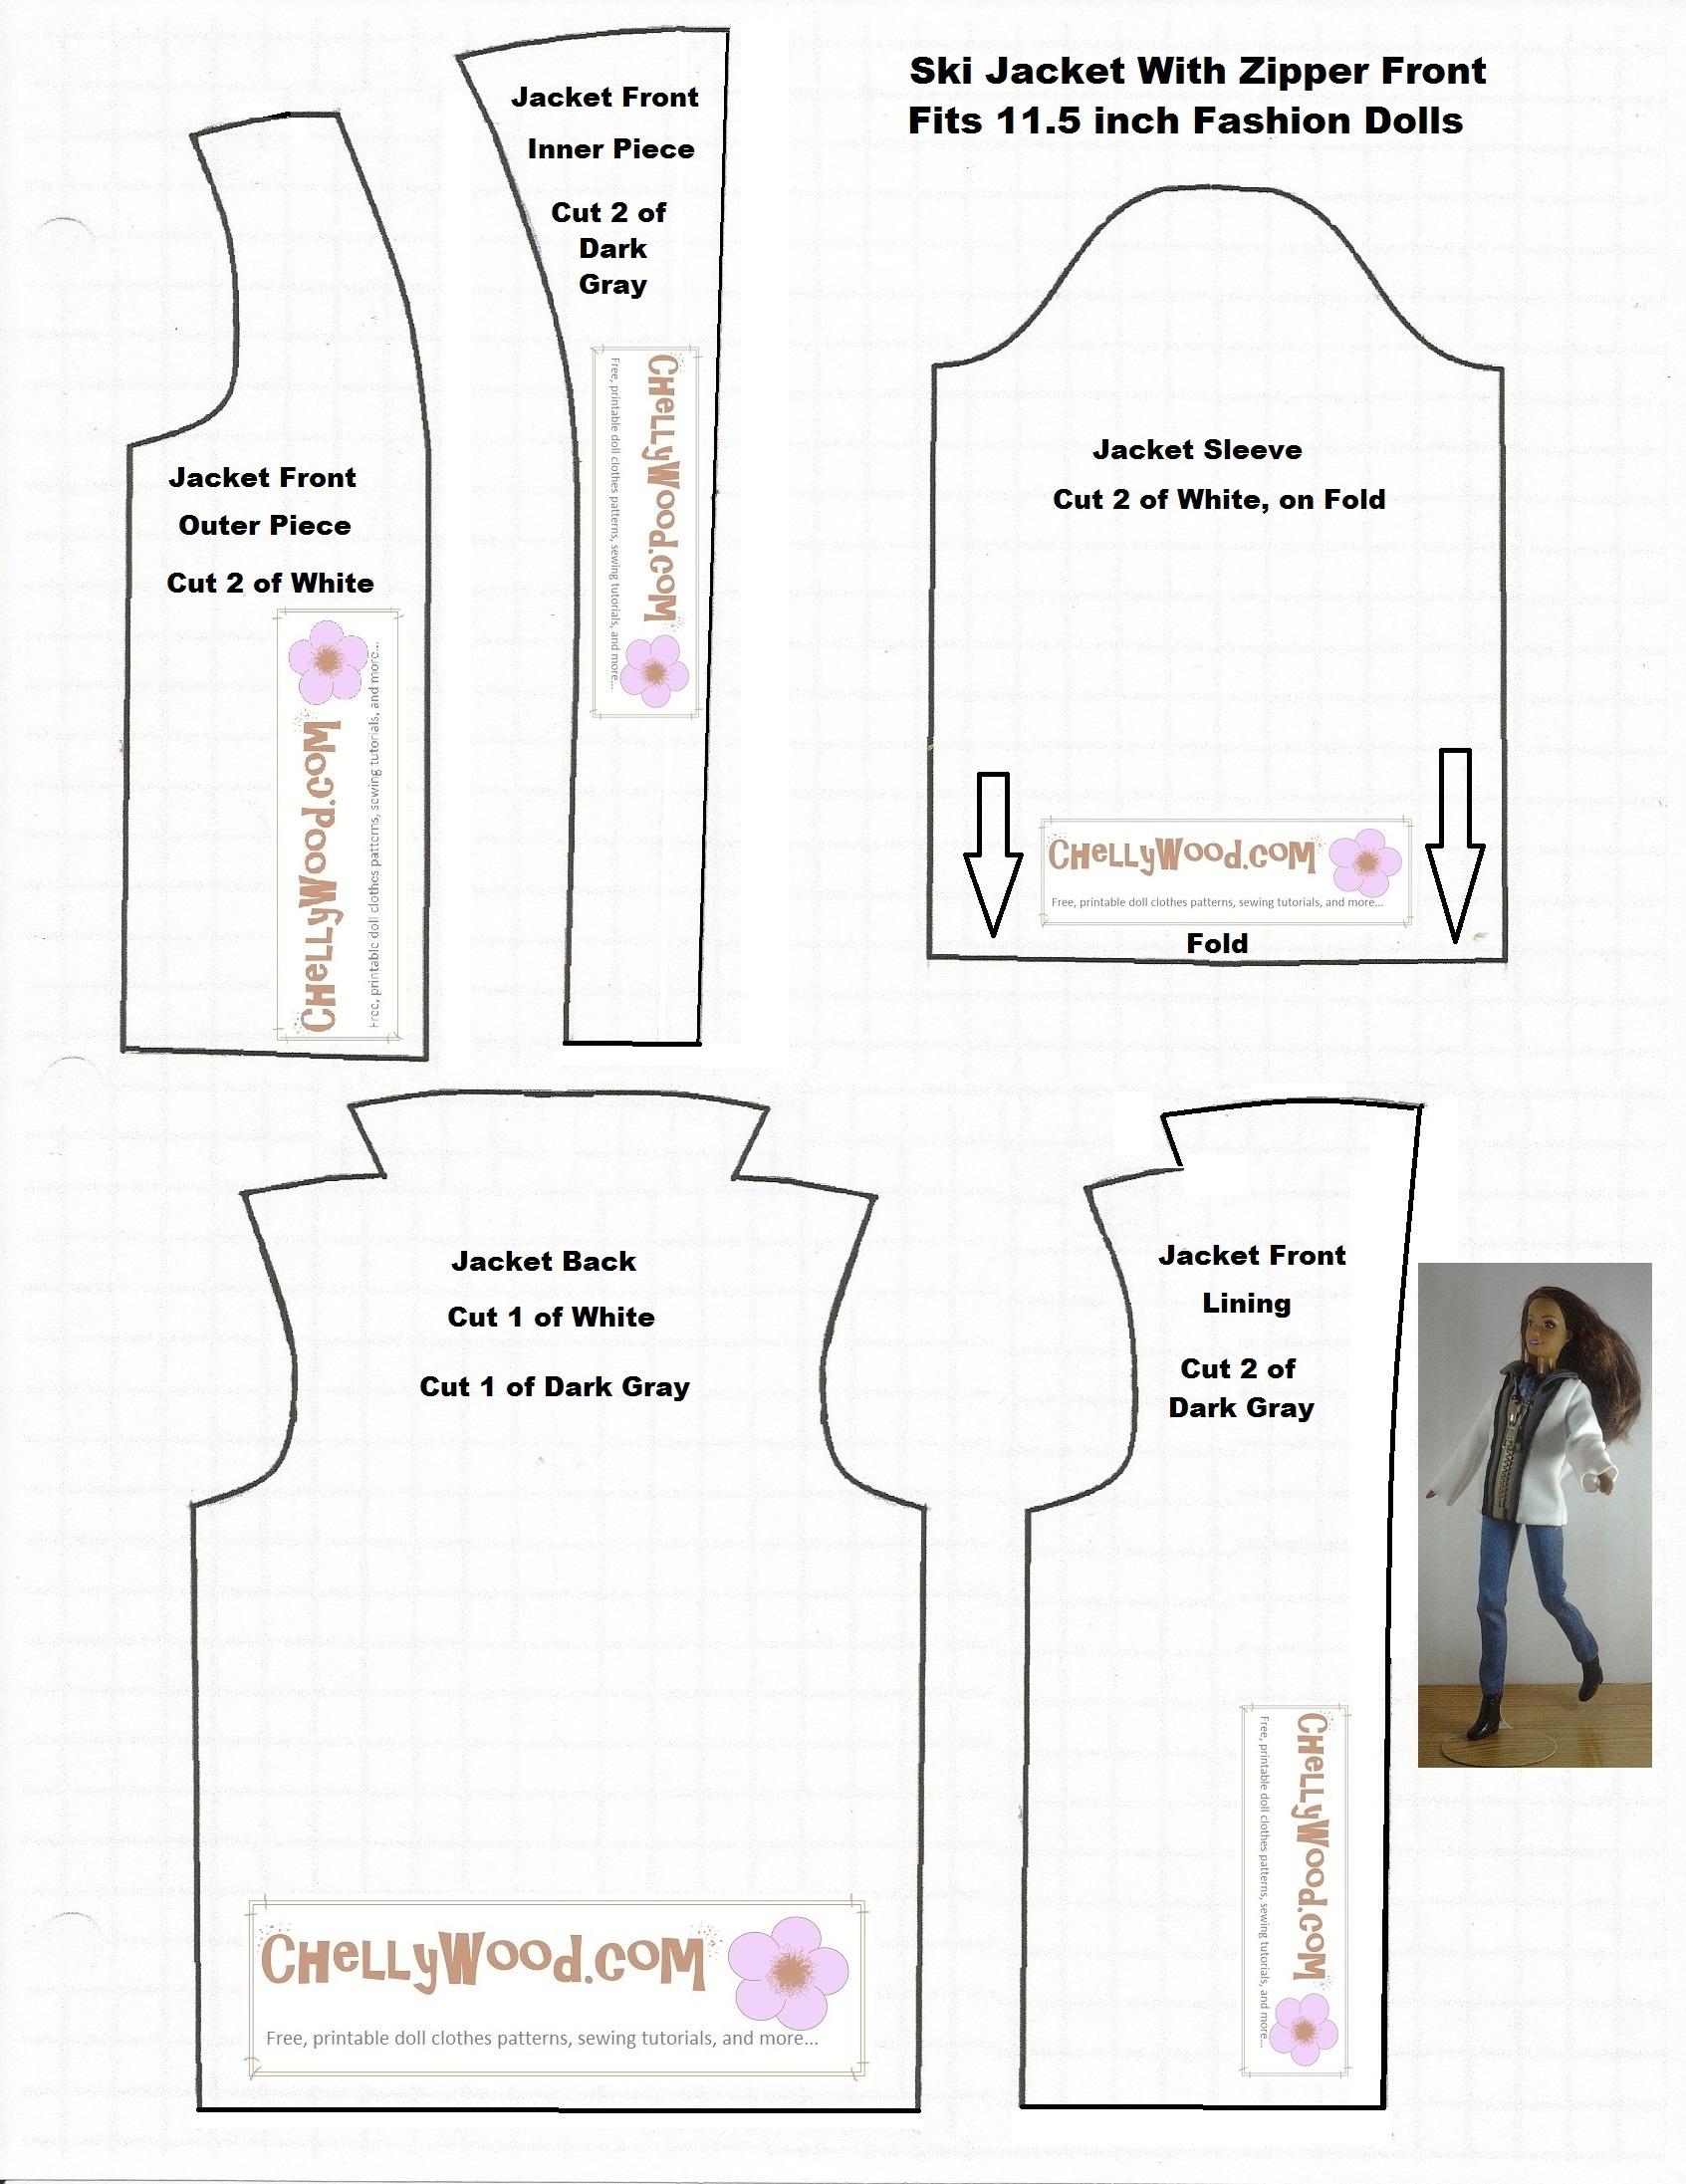 Barbie Dress Patterns Free Printable Pdf - Free Printable Sewing Patterns Pdf